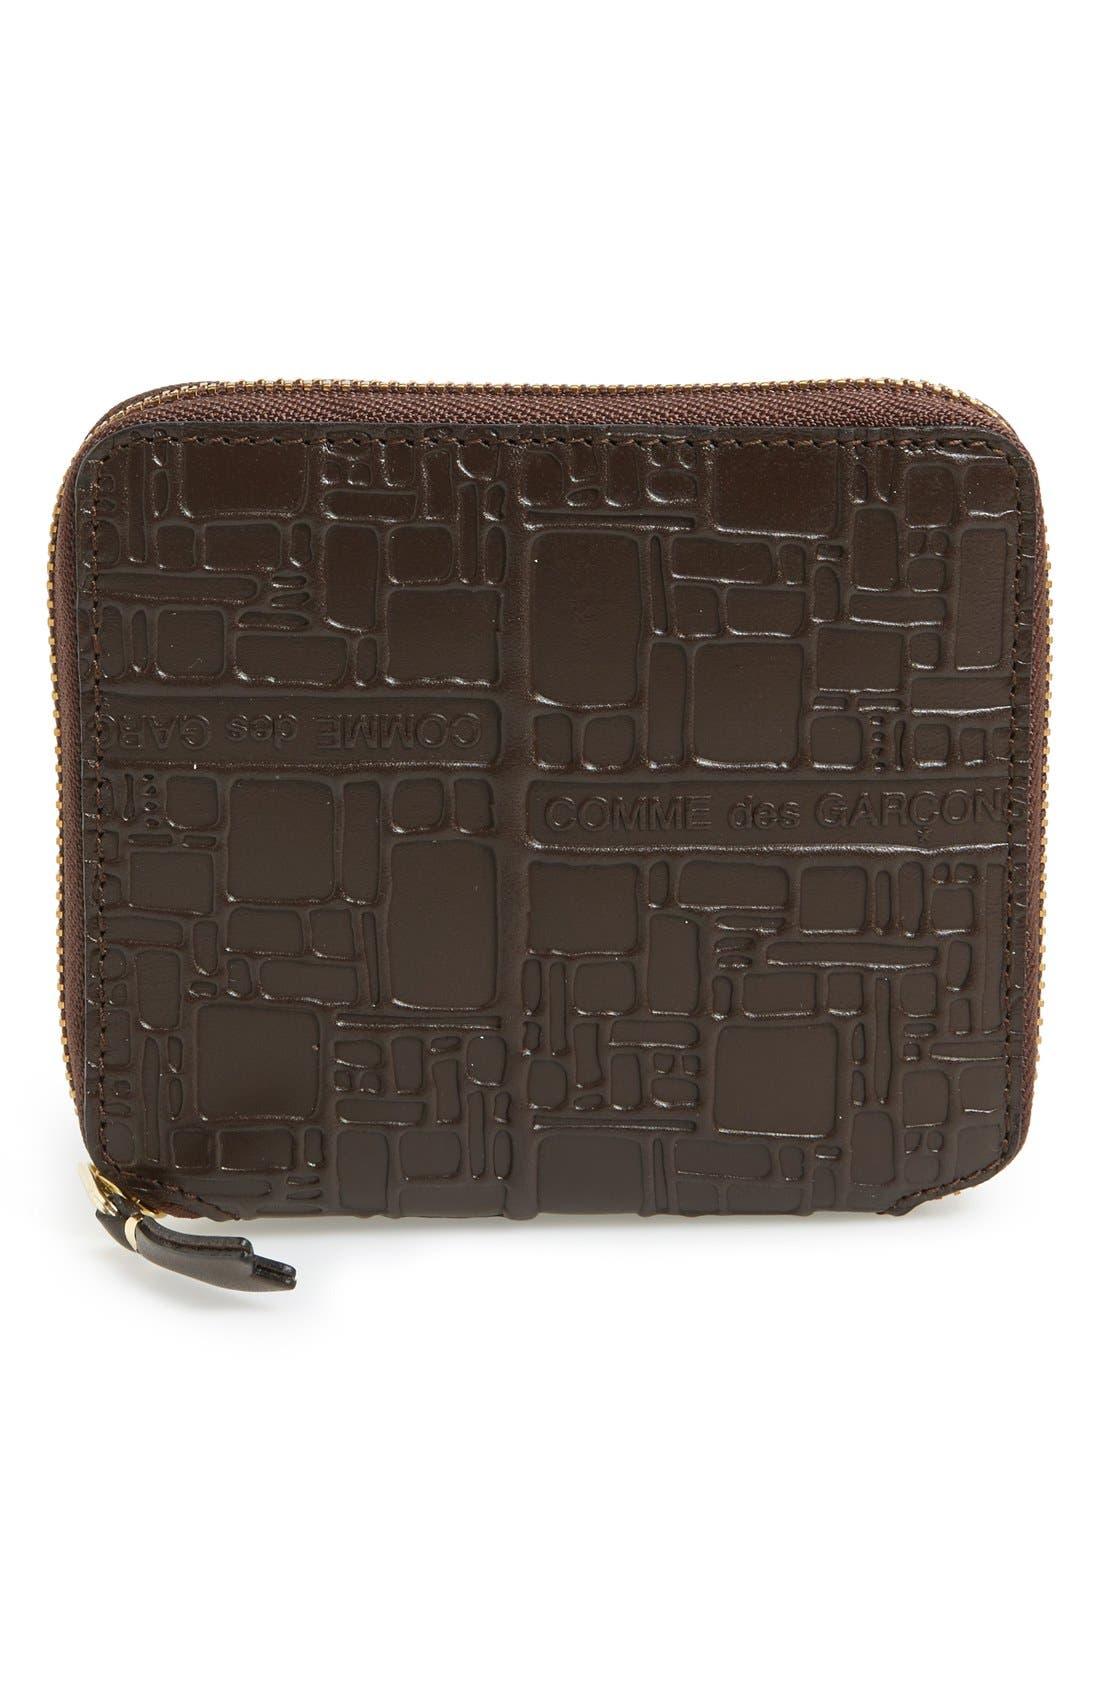 Alternate Image 1 Selected - Comme de Garçons Embossed French Wallet